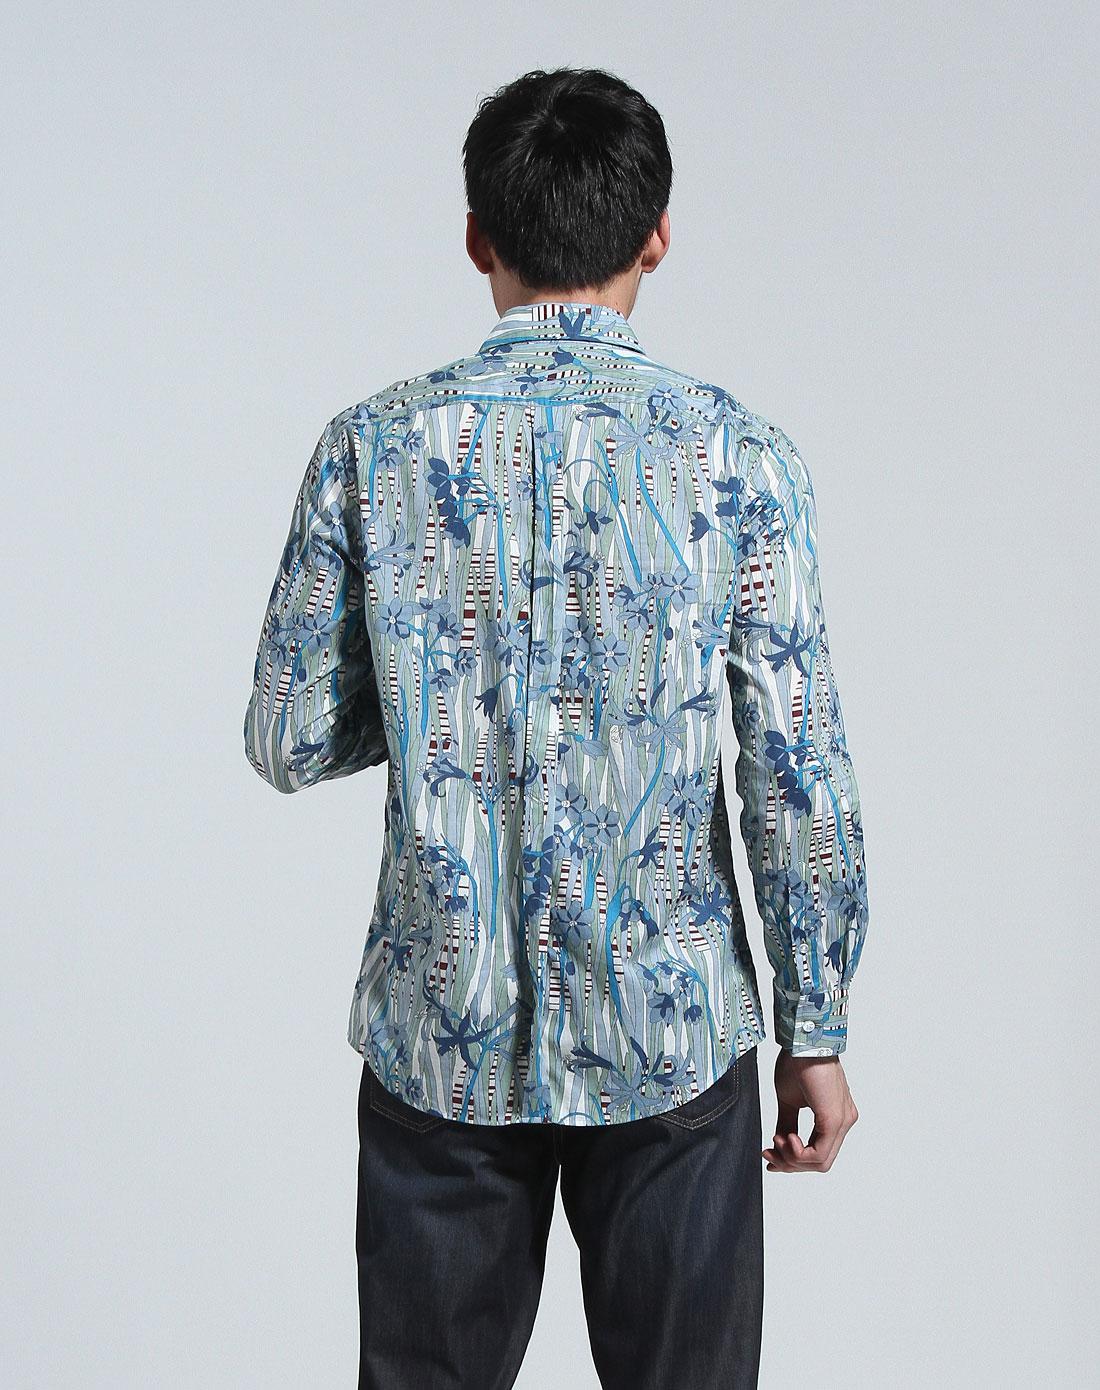 斯托梵诺stovenno蓝绿色花纹时尚长袖衬衫2130697231